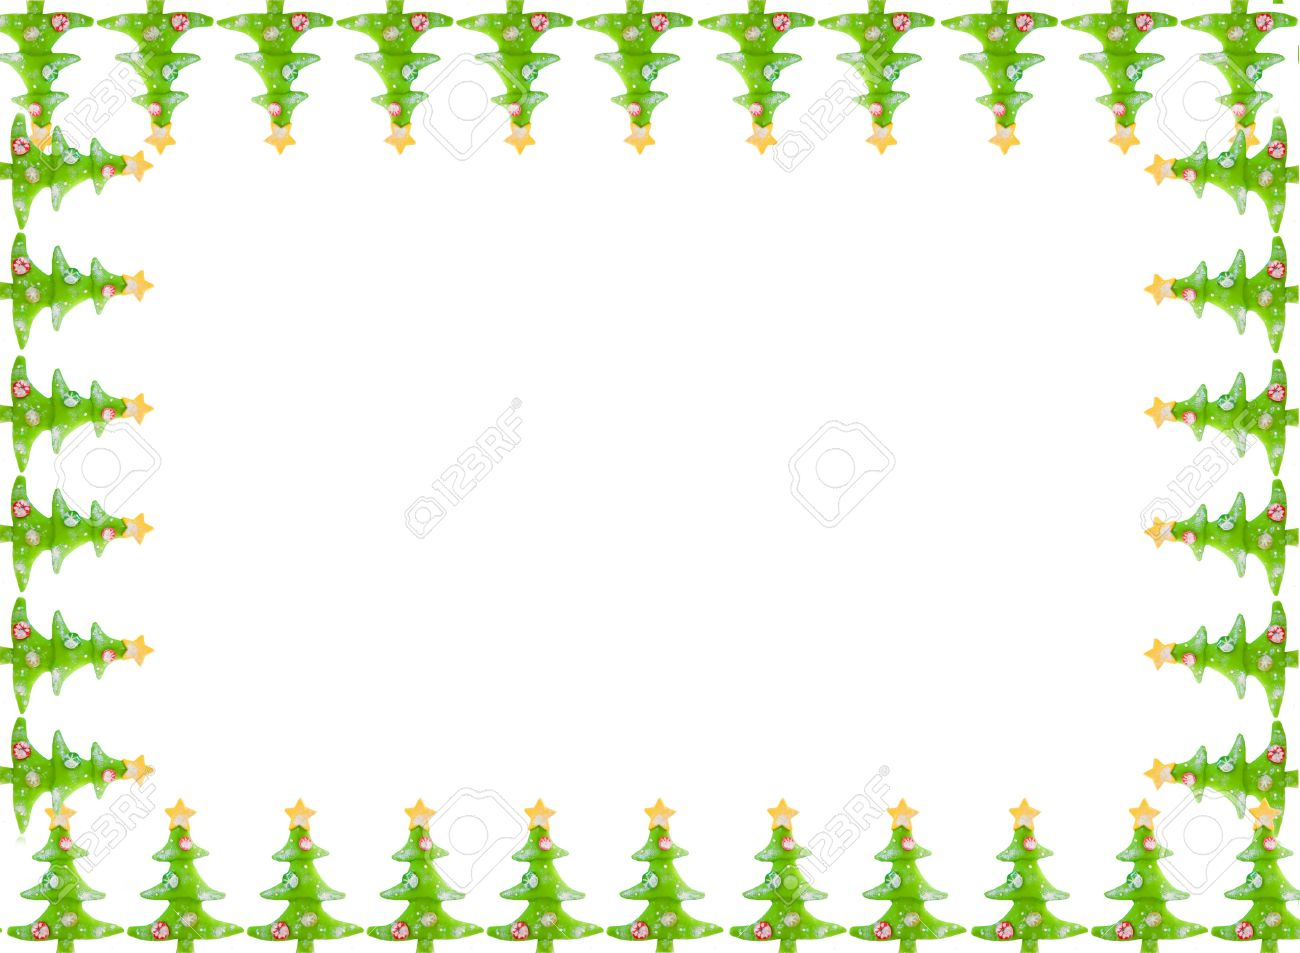 1300x953 Decorative Christmas Tree Border Merry Christmas Amp Happy New